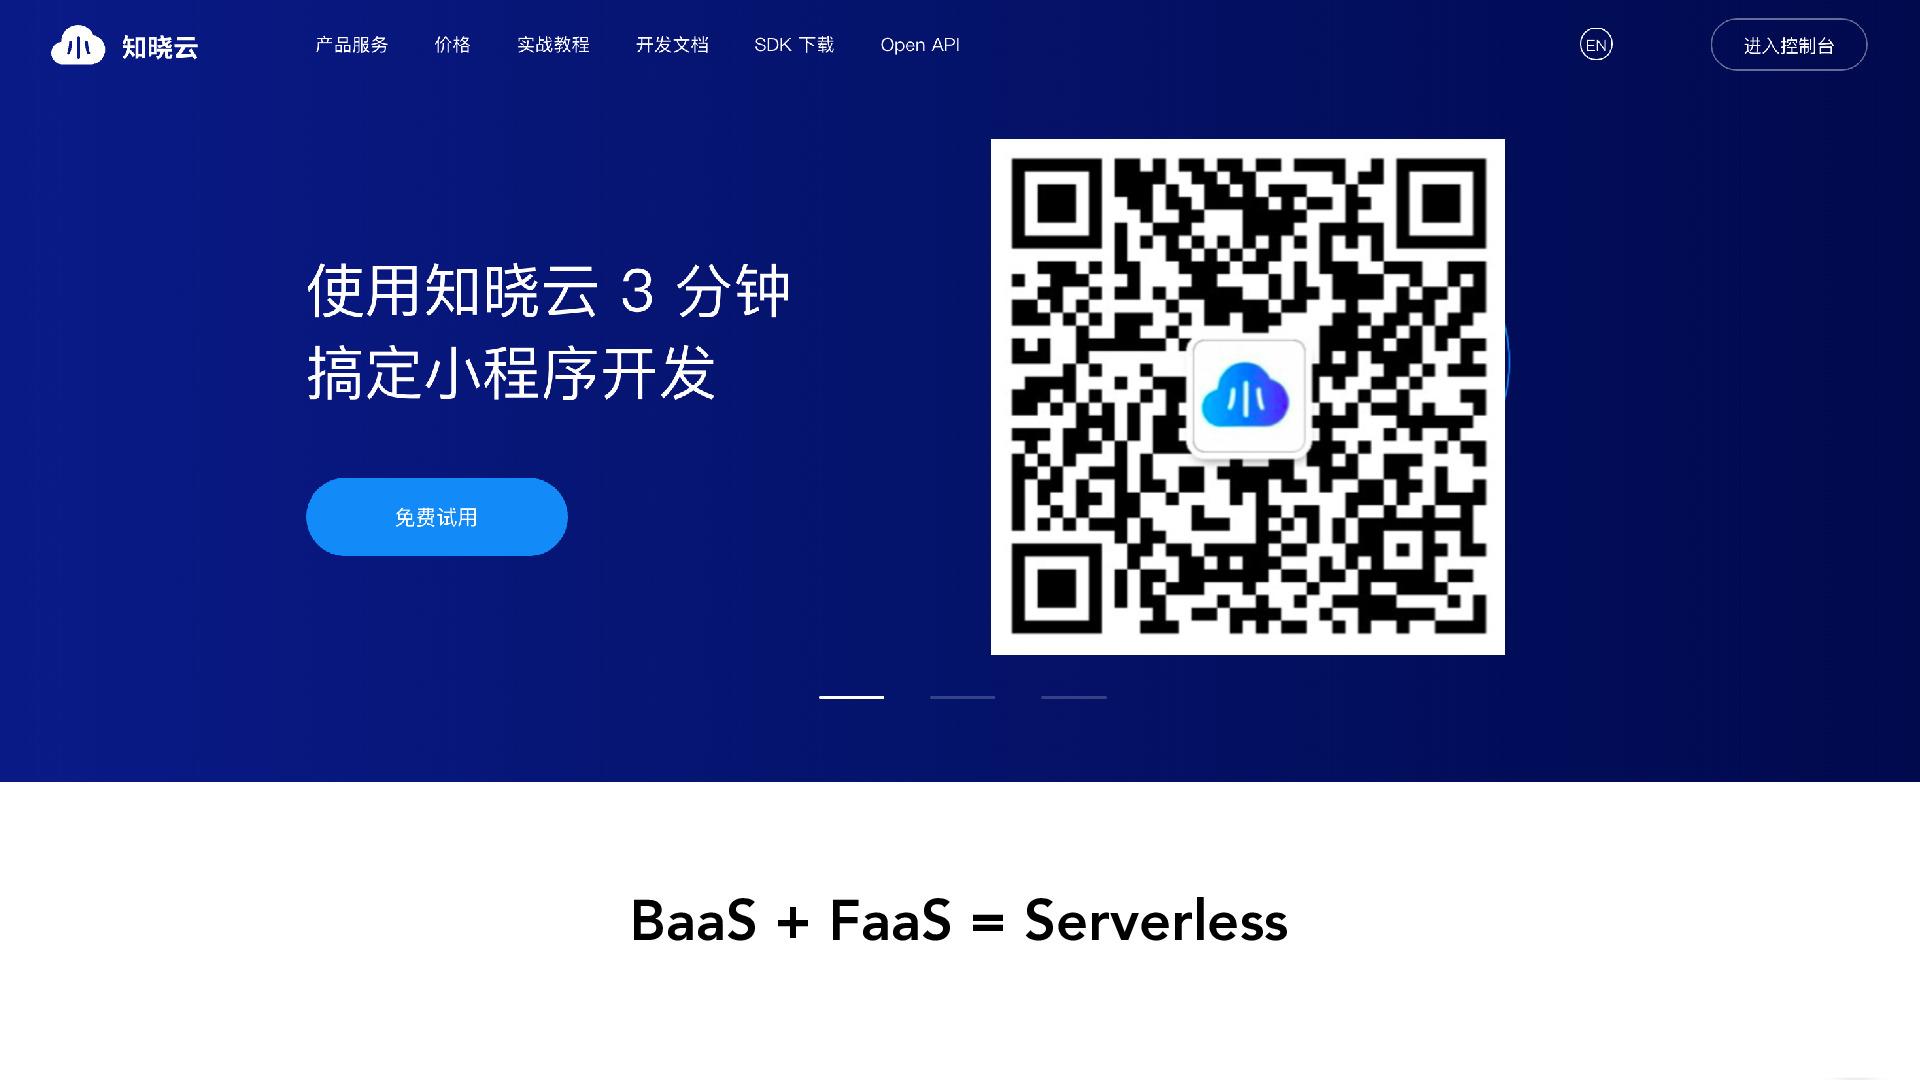 https://opentalk-blog.b0.upaiyun.com/prod/2018-10-15/d98a555976daa1b63dbd03b50b337a5e